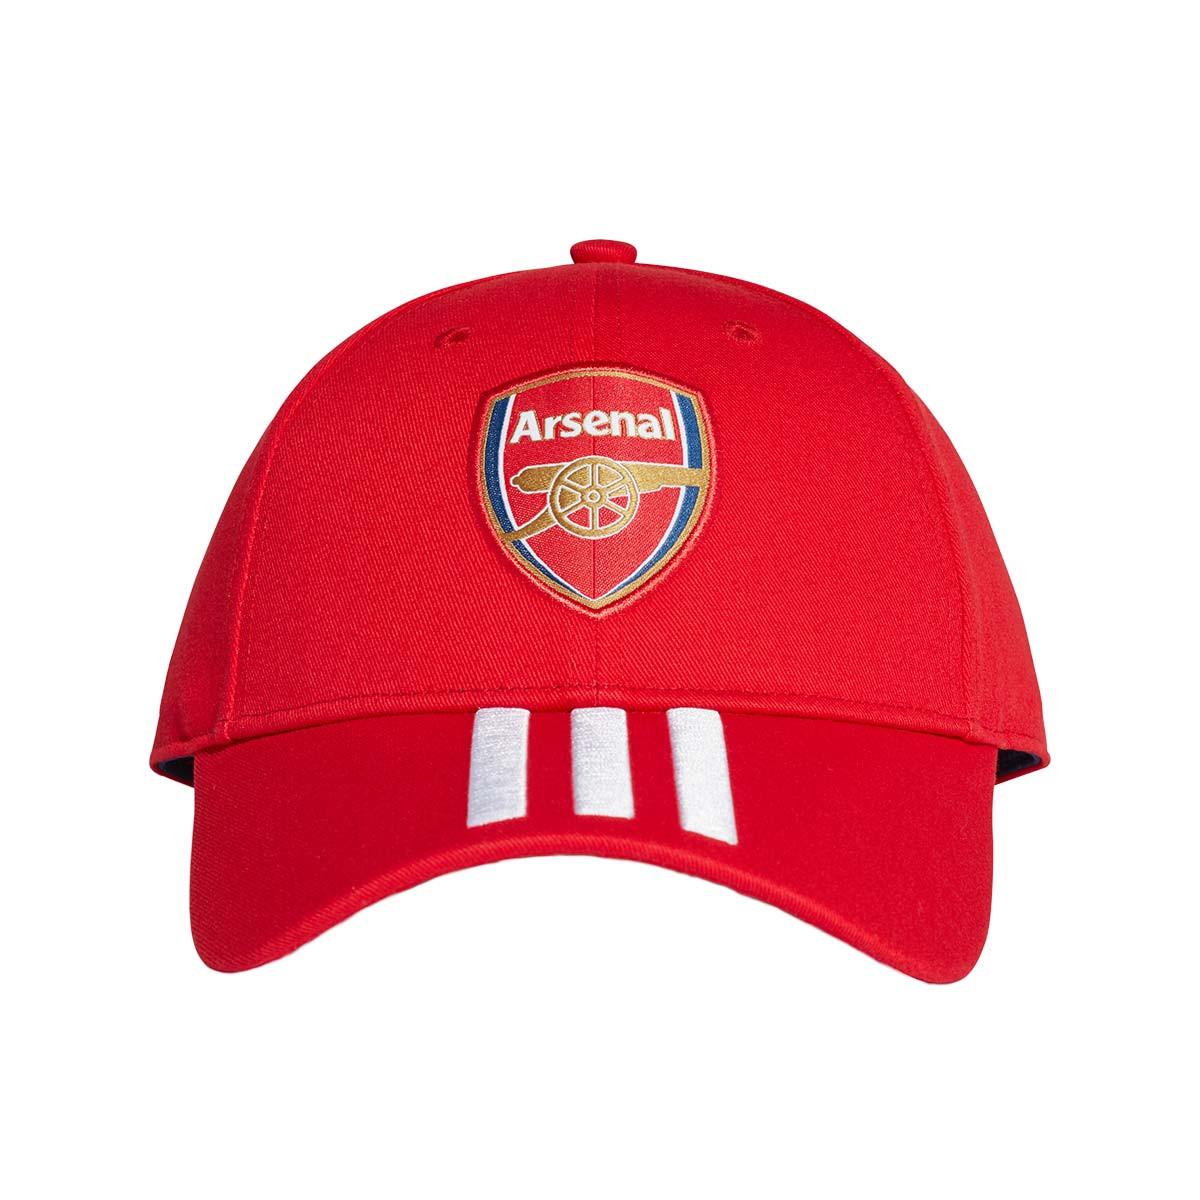 adidas Arsenal FC C40 2019 2020 Cap